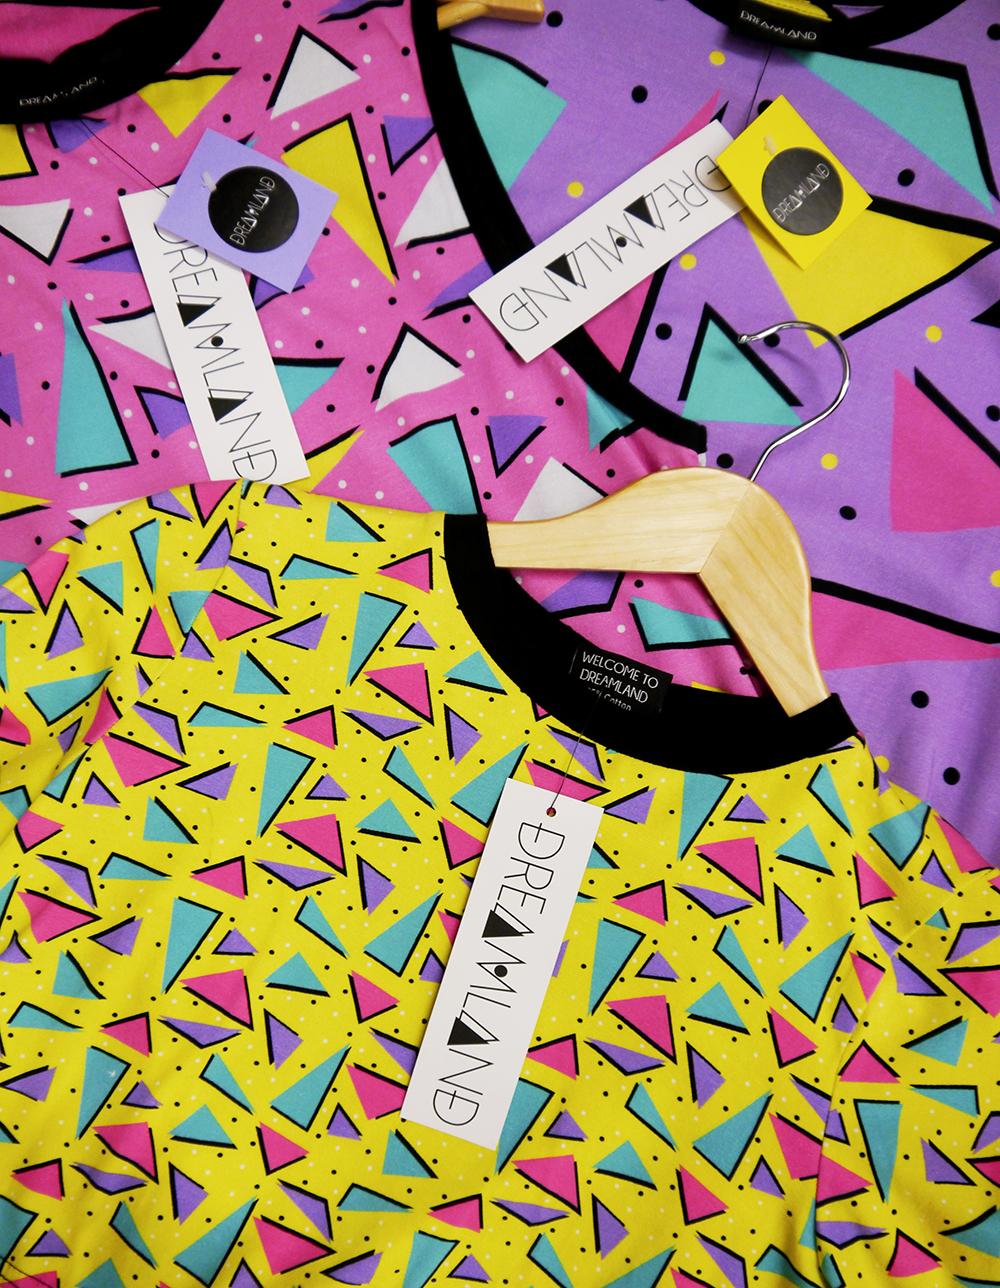 studio visit, designer studio, local designer, Scottish designer, Dundee designer, Dreamland, Dreamland Clothing label, colourful design, Wasps Artists Studios, Dundee Artist studios, Kickstarter Campaign, saved by the bell inspired clothing, Kickstarter, shop local